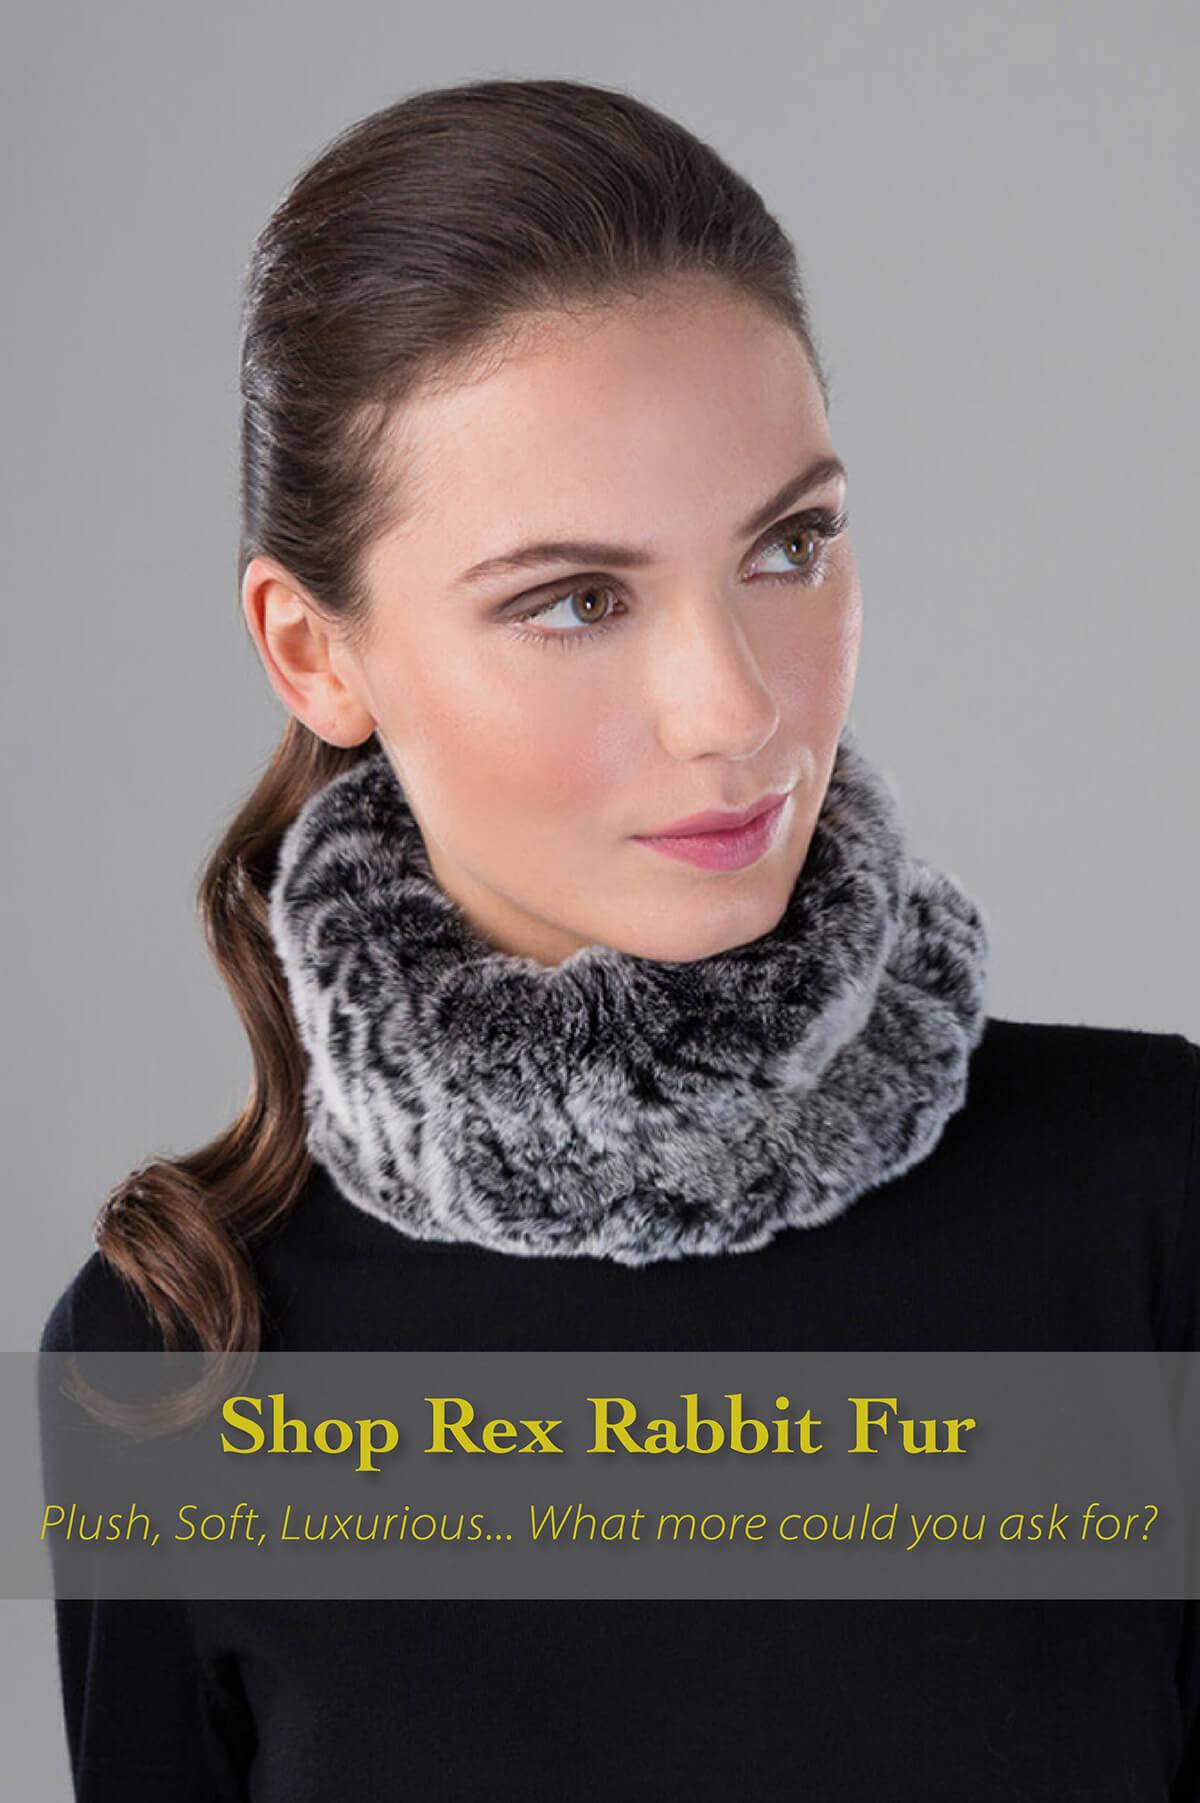 Shop Rex Rabbit fur